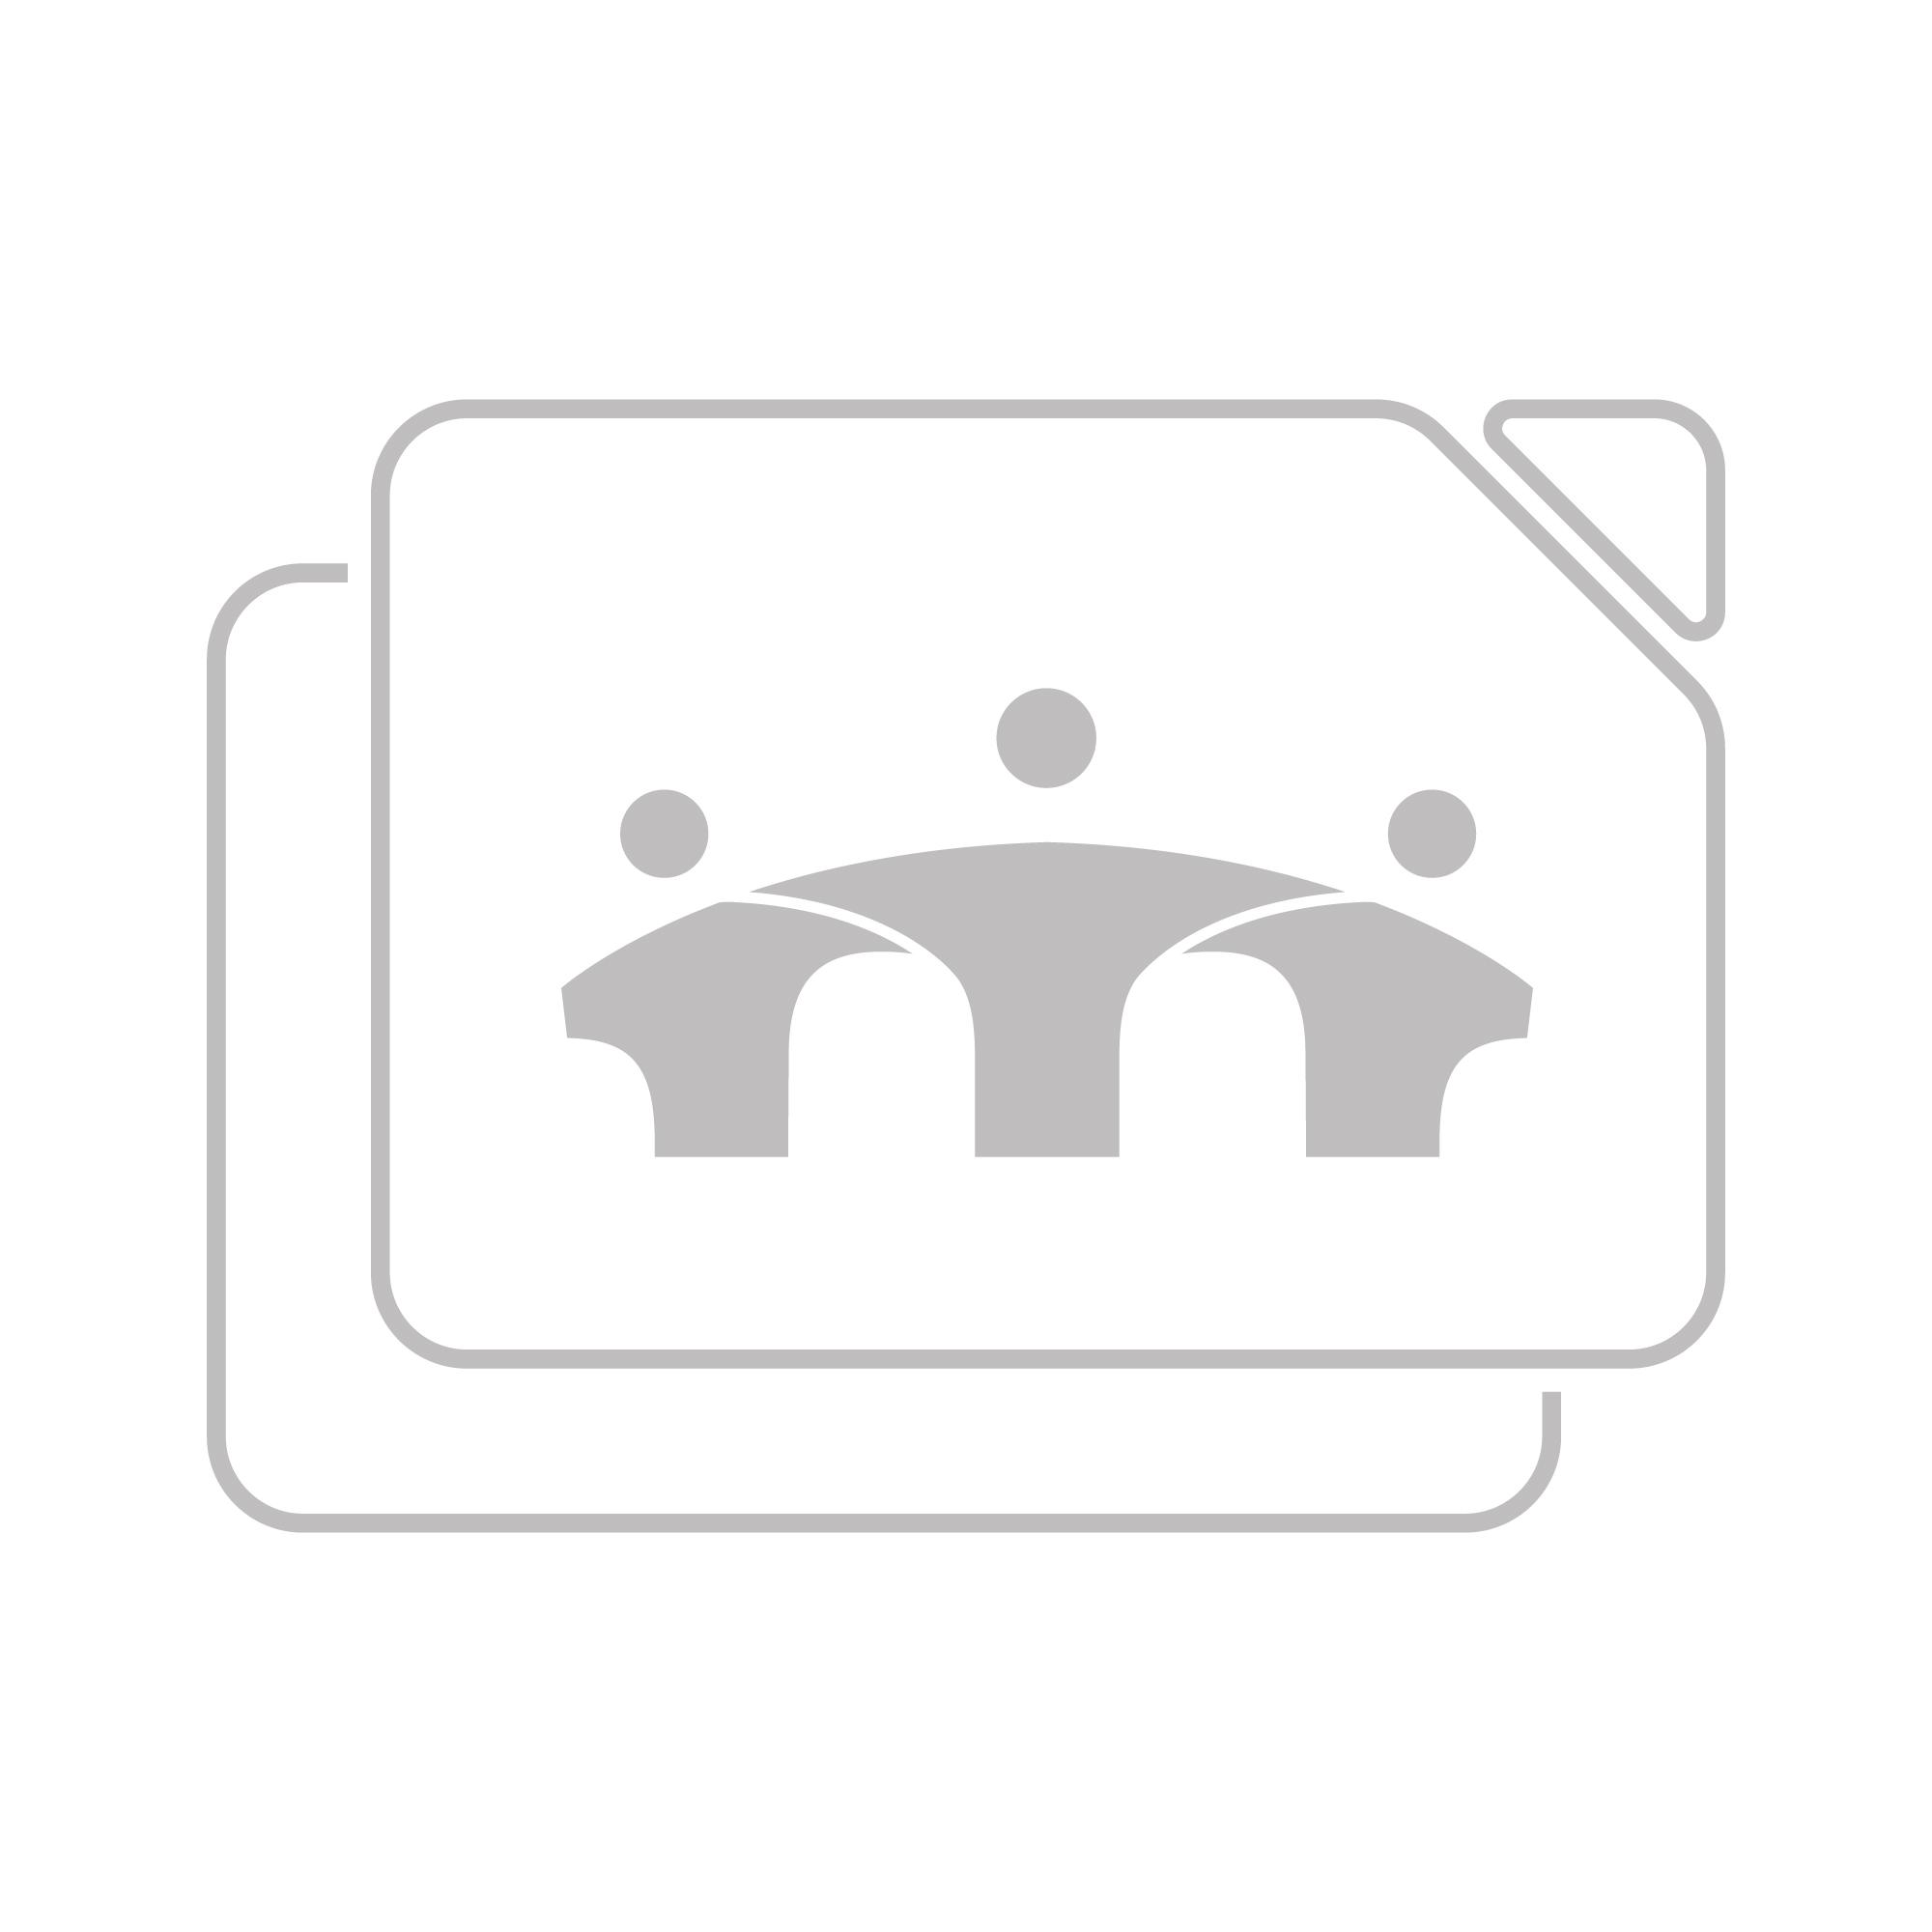 Logitech K380 for Mac Multi-Device Bluetooth Keyboard - ROSE - CH - CENTRAL